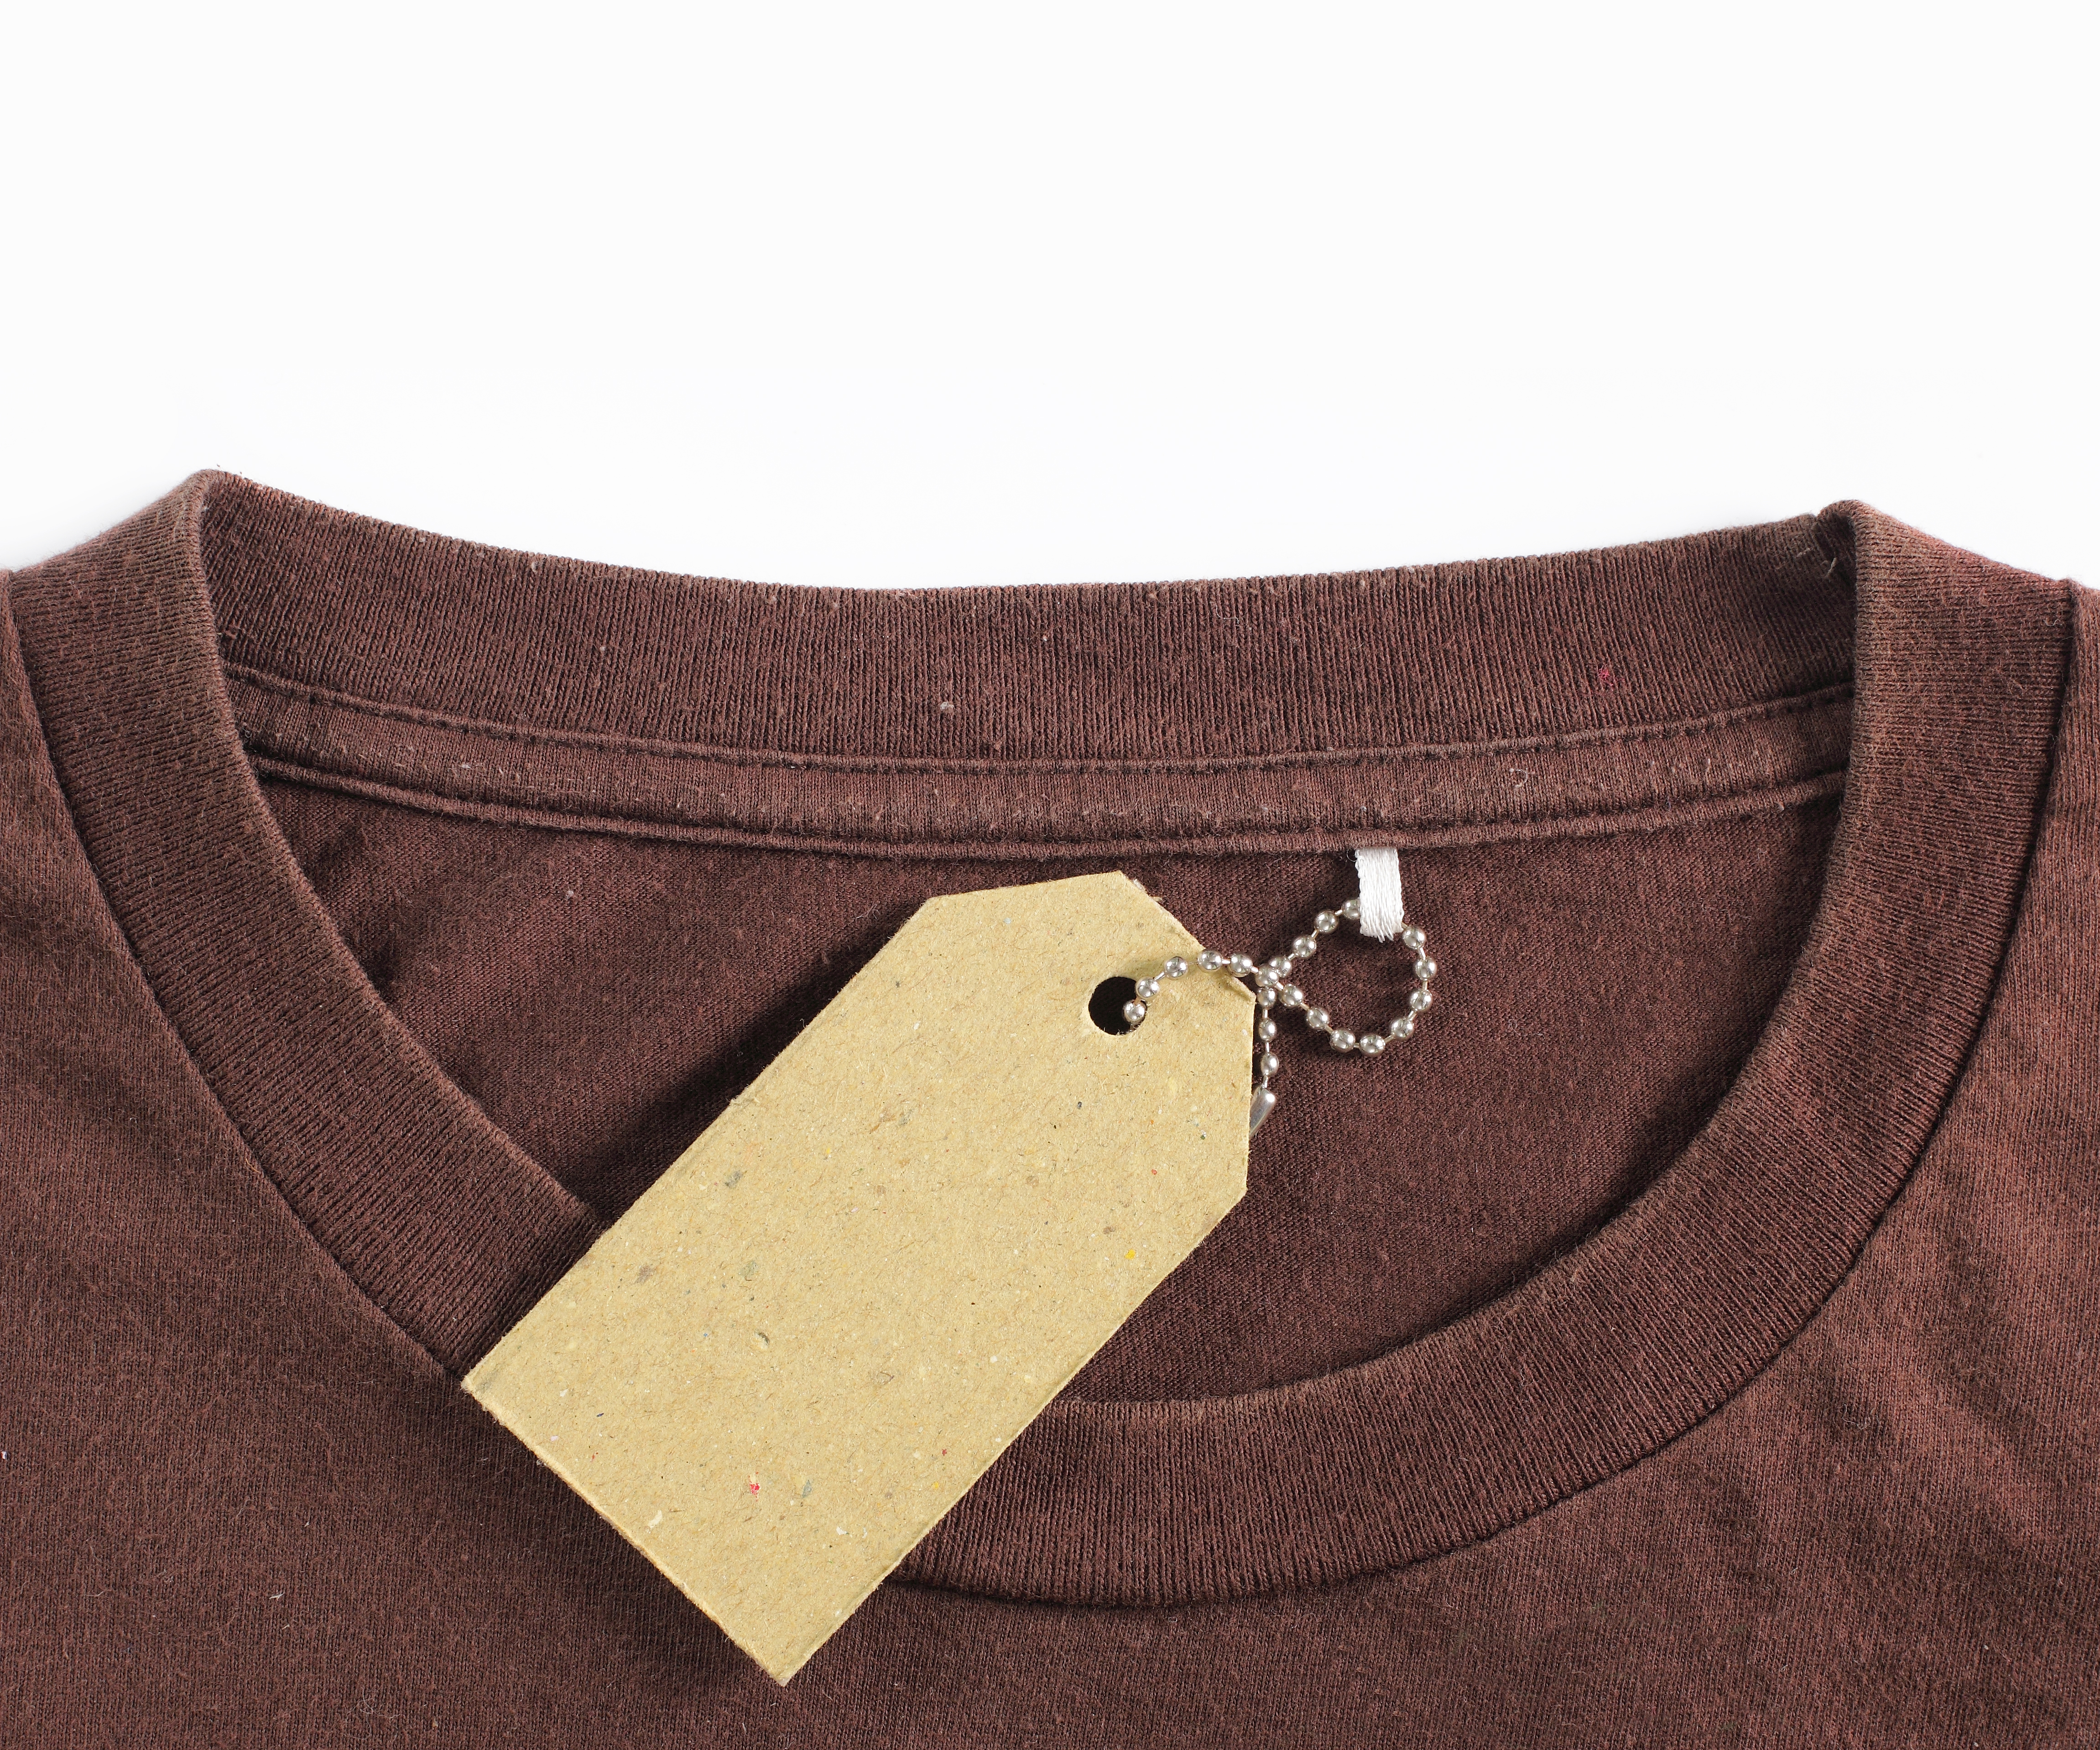 Garment hang tags (27)